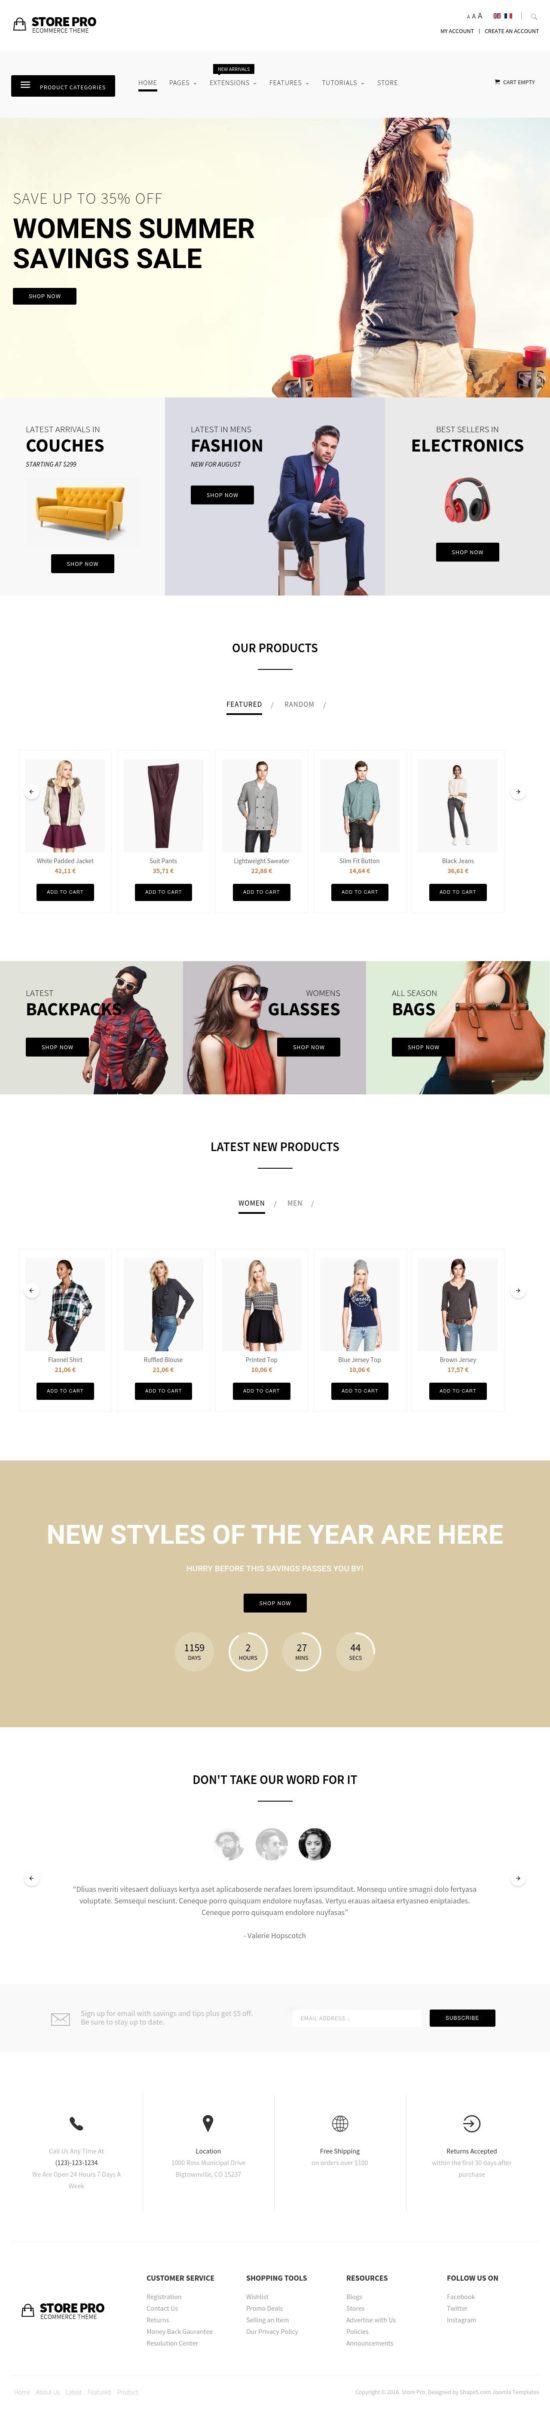 store-pro-shape5-joomla-template-01